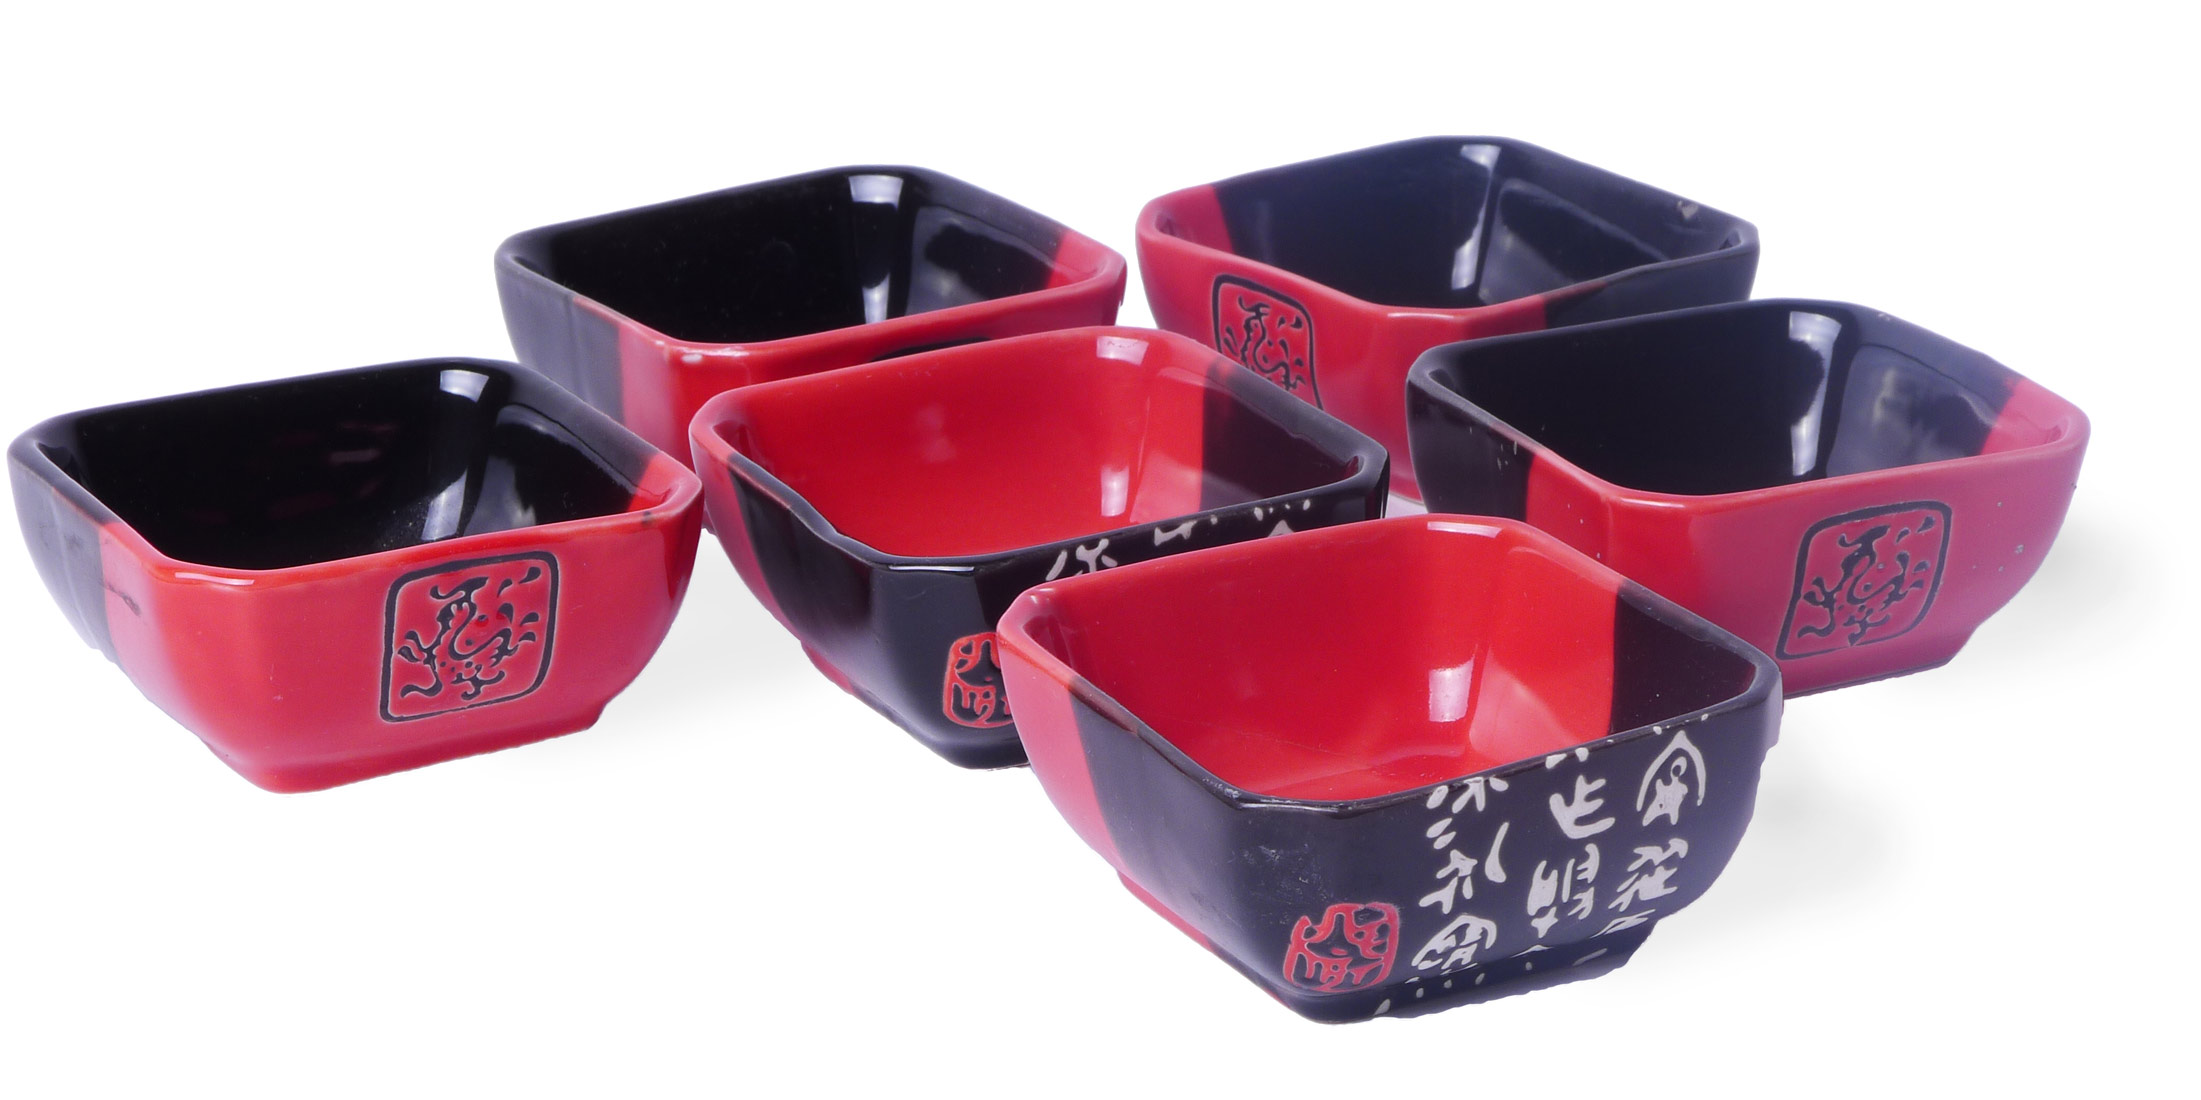 Image of Sushi Dipping Dish Set of 6